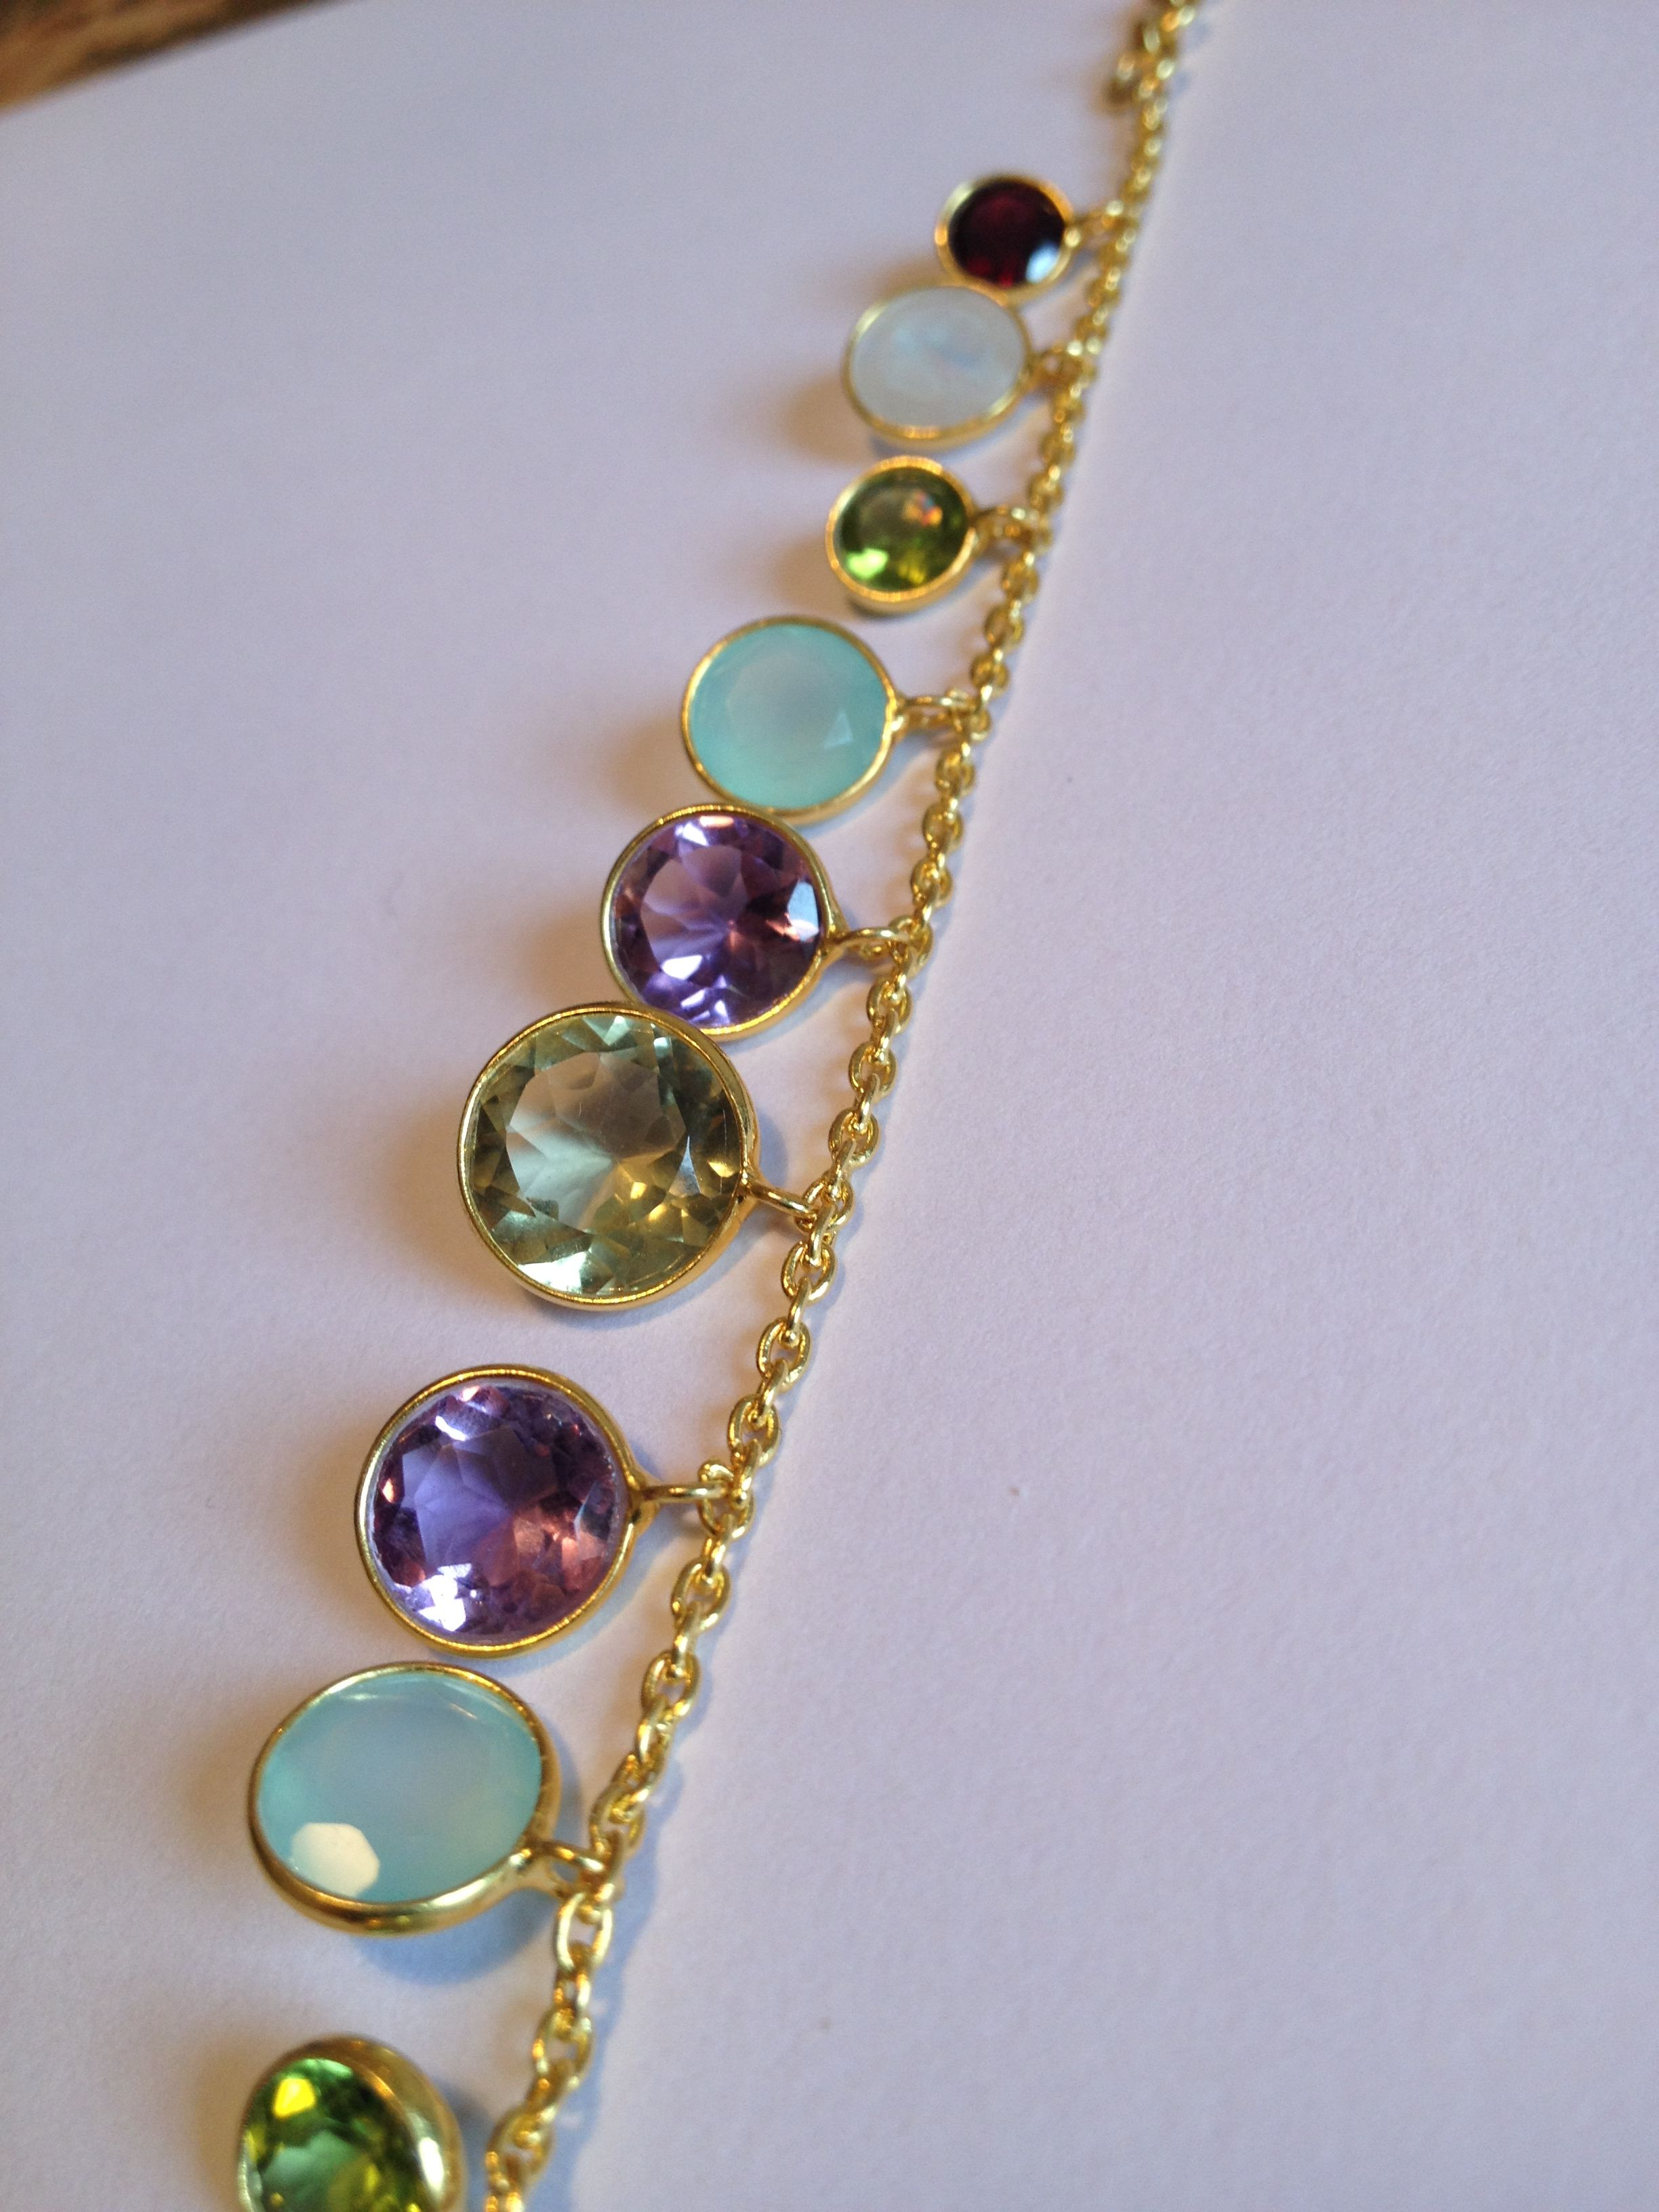 Multi gem set charm bracelet - classic